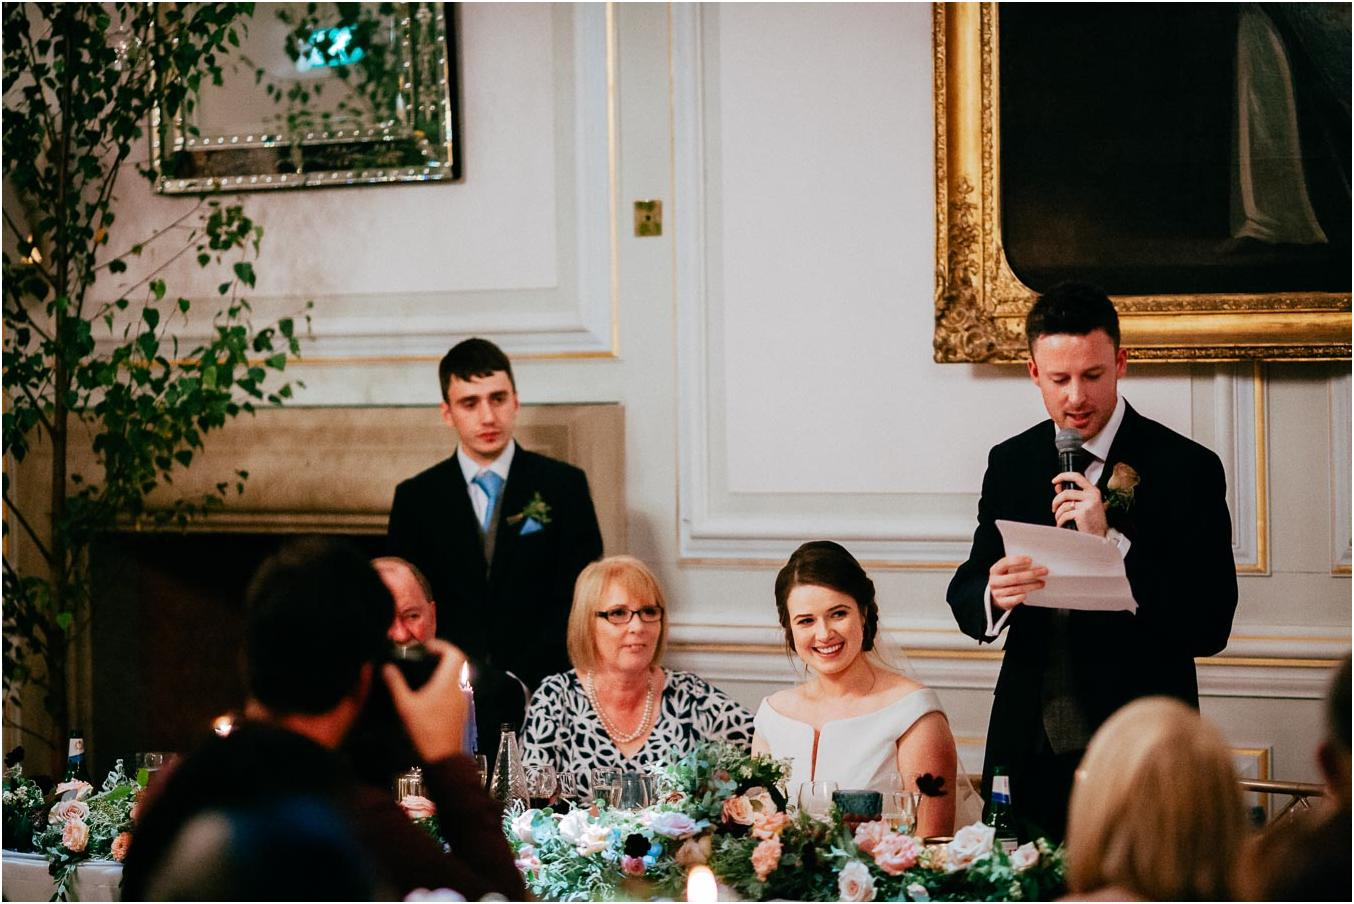 Hassop_Hall_Wedding_Photographs-106.jpg